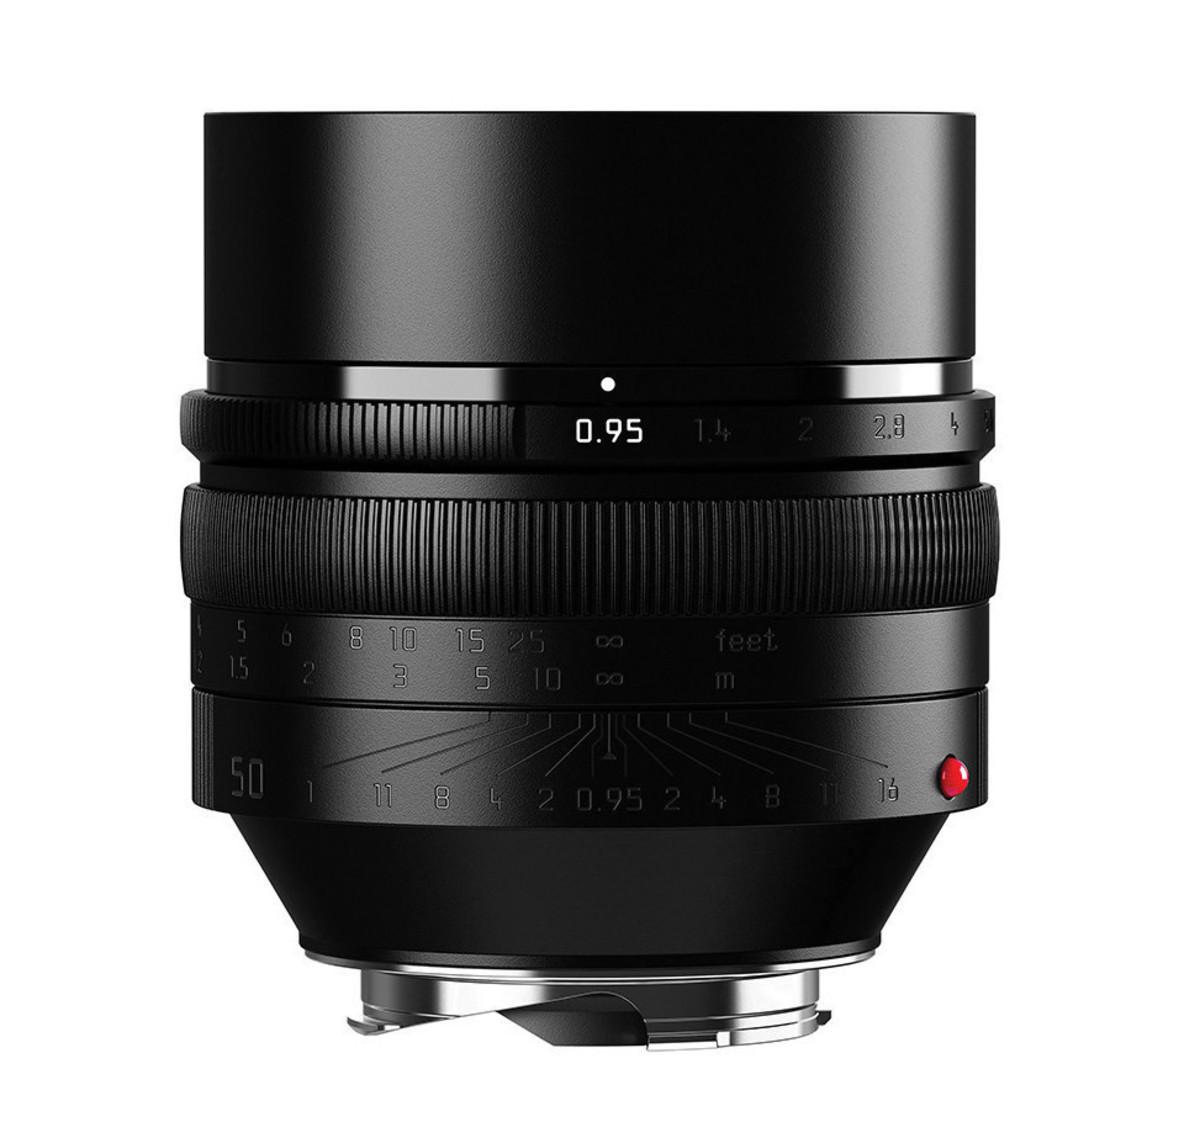 Leica 50mm Noctilux Edition 0.95